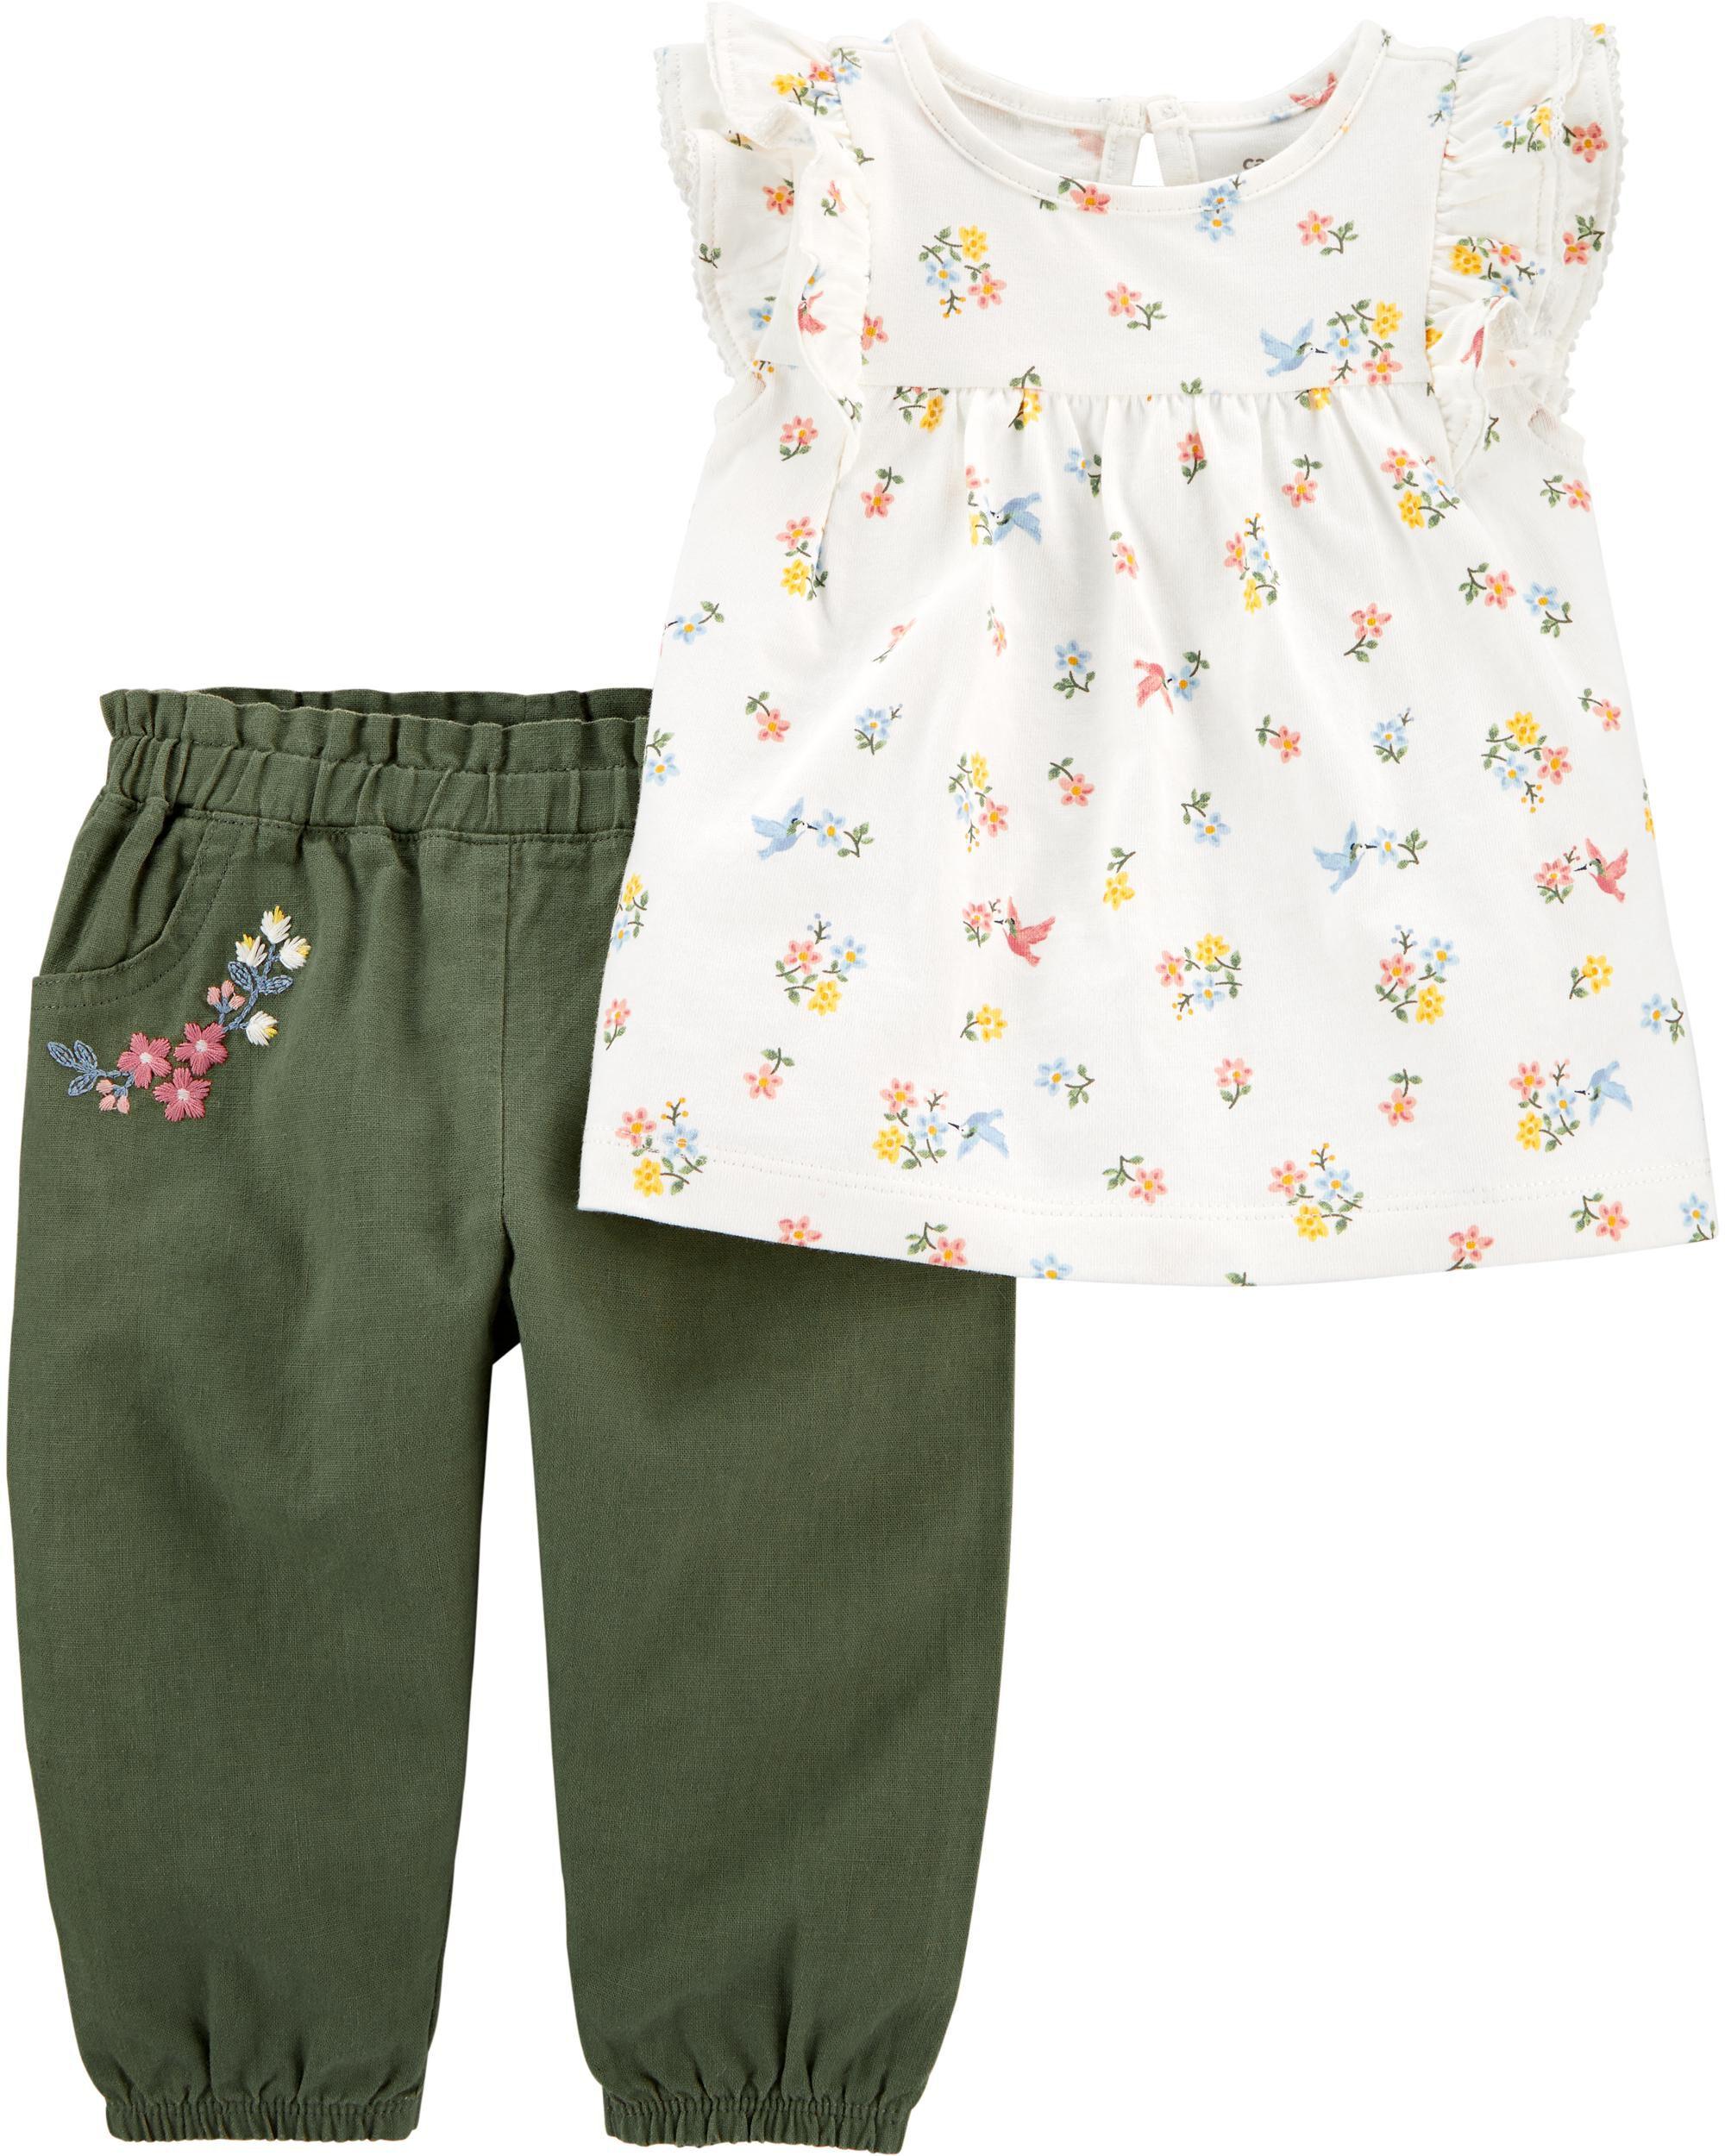 *CLEARANCE* 2-Piece Floral Jersey Top & Linen Pant Set